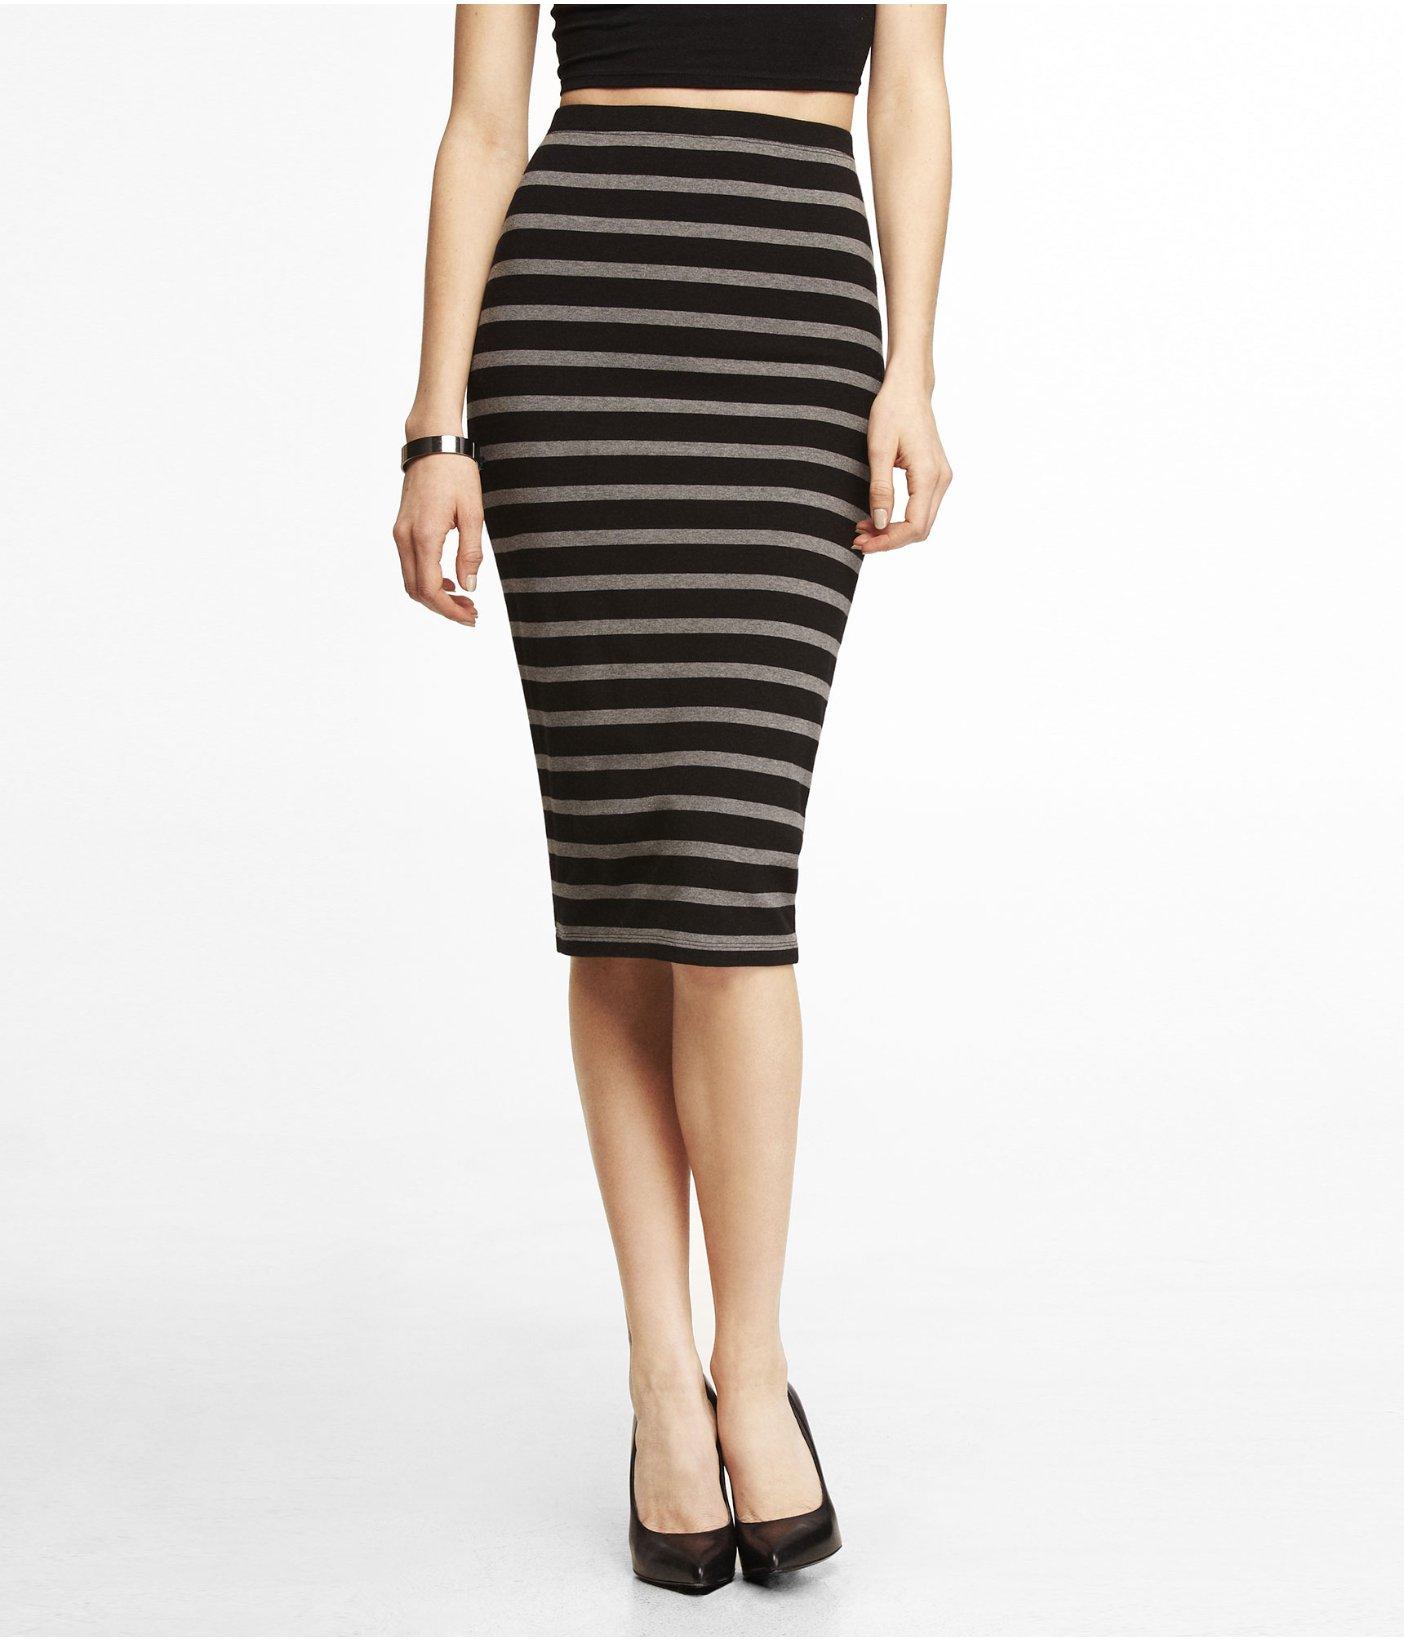 express striped stretch knit midi pencil skirt in gray lyst